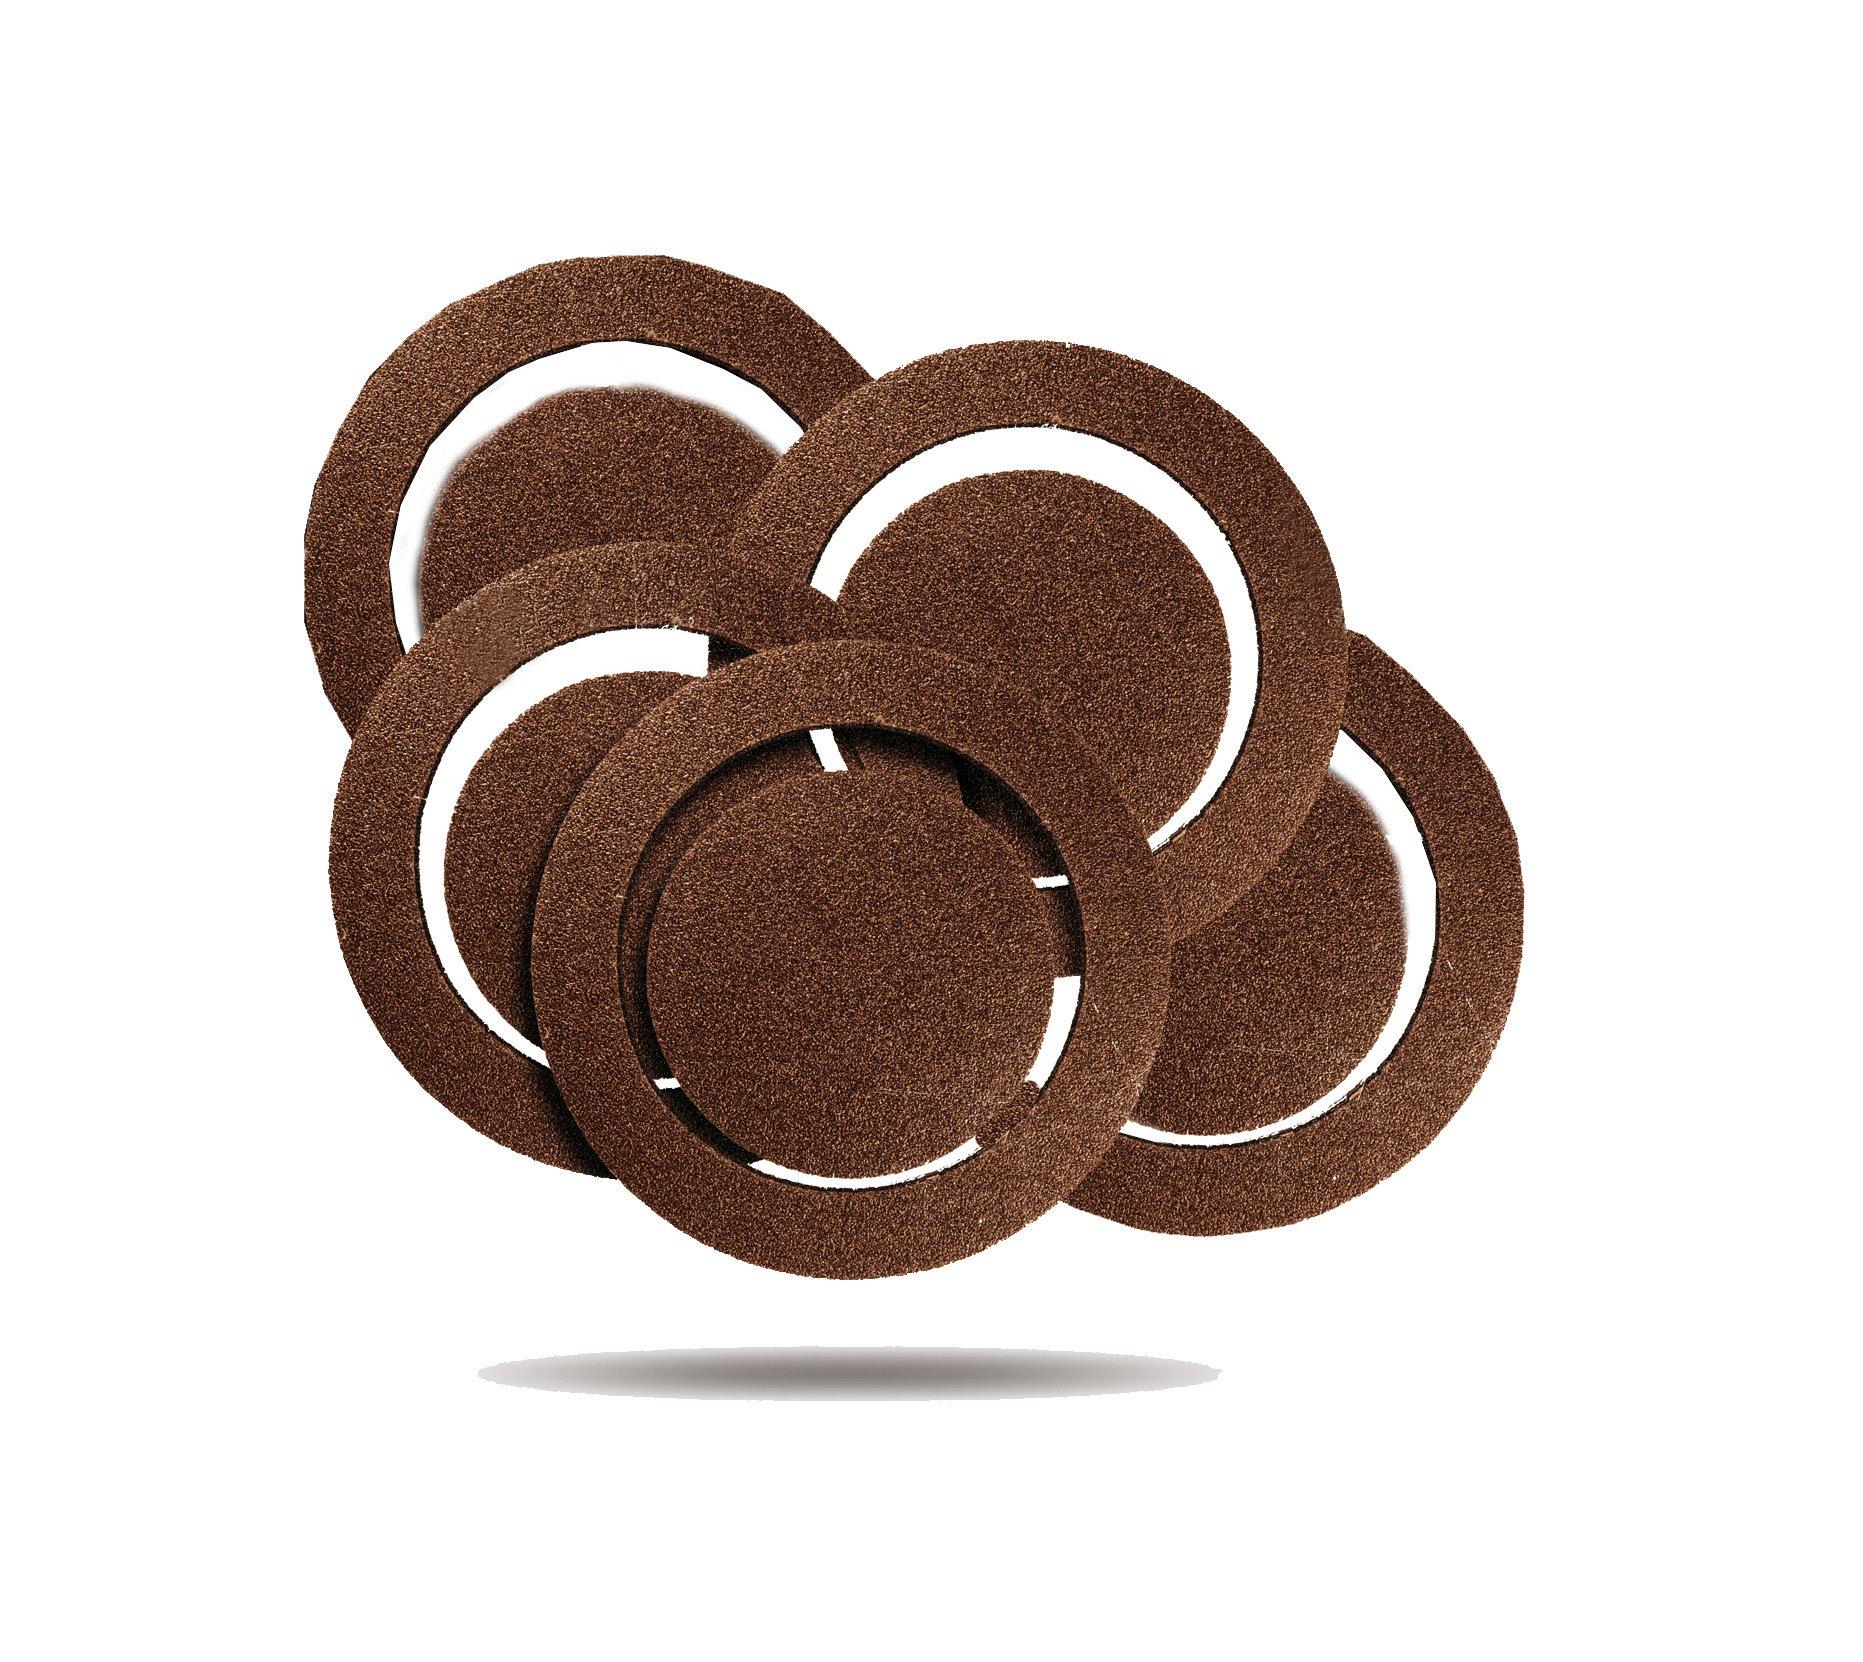 Rockwell RW9215 5-Inch 120 grit Sanding discs, 5-Pack for RK4245K, 5-Pack for RK4247K